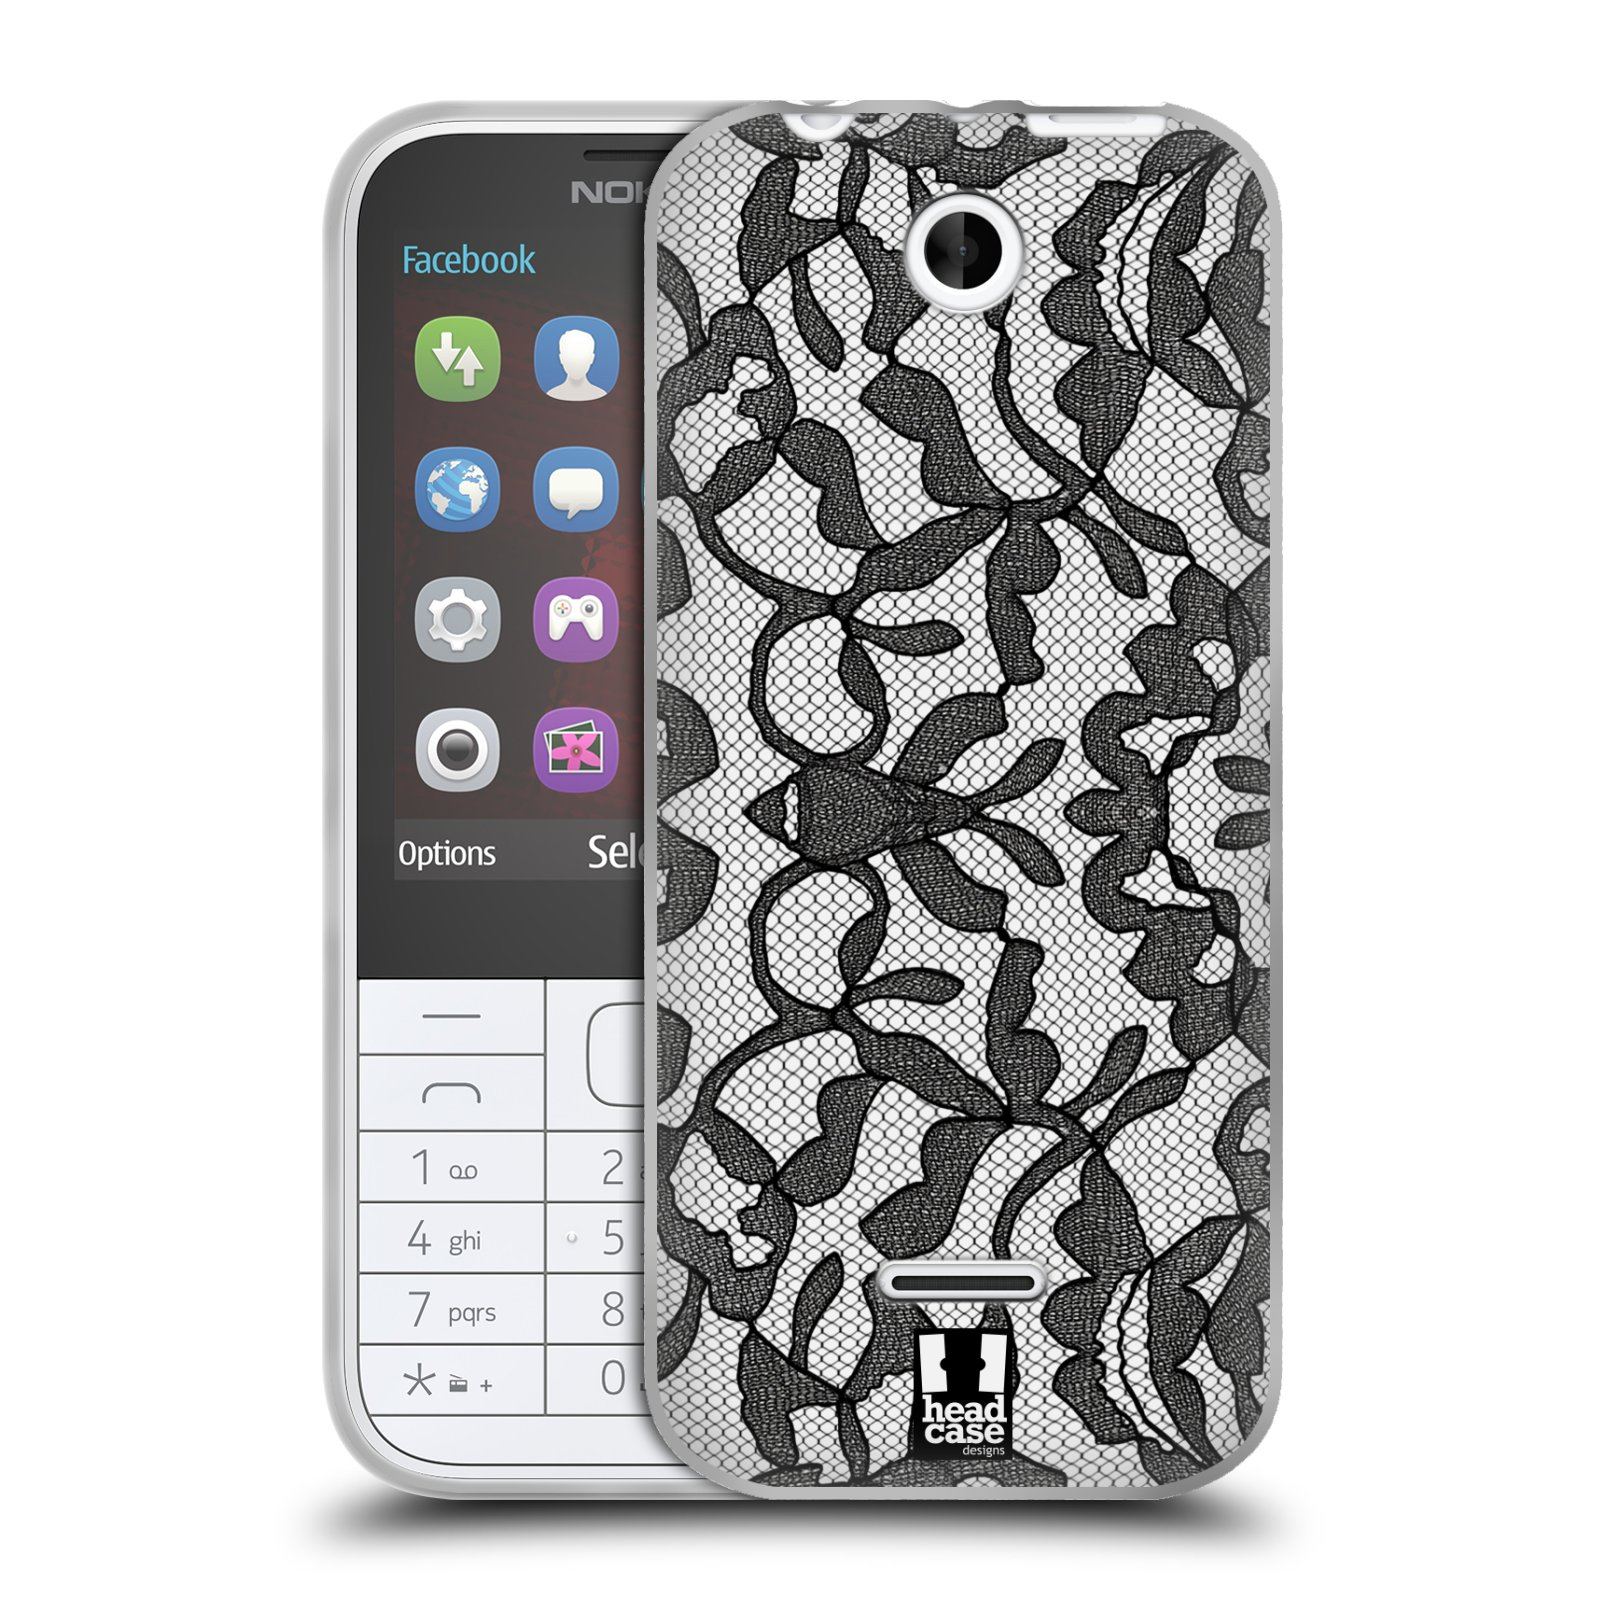 Silikonové pouzdro na mobil Nokia 225 HEAD CASE LEAFY KRAJKA (Silikonový kryt či obal na mobilní telefon Nokia 225)